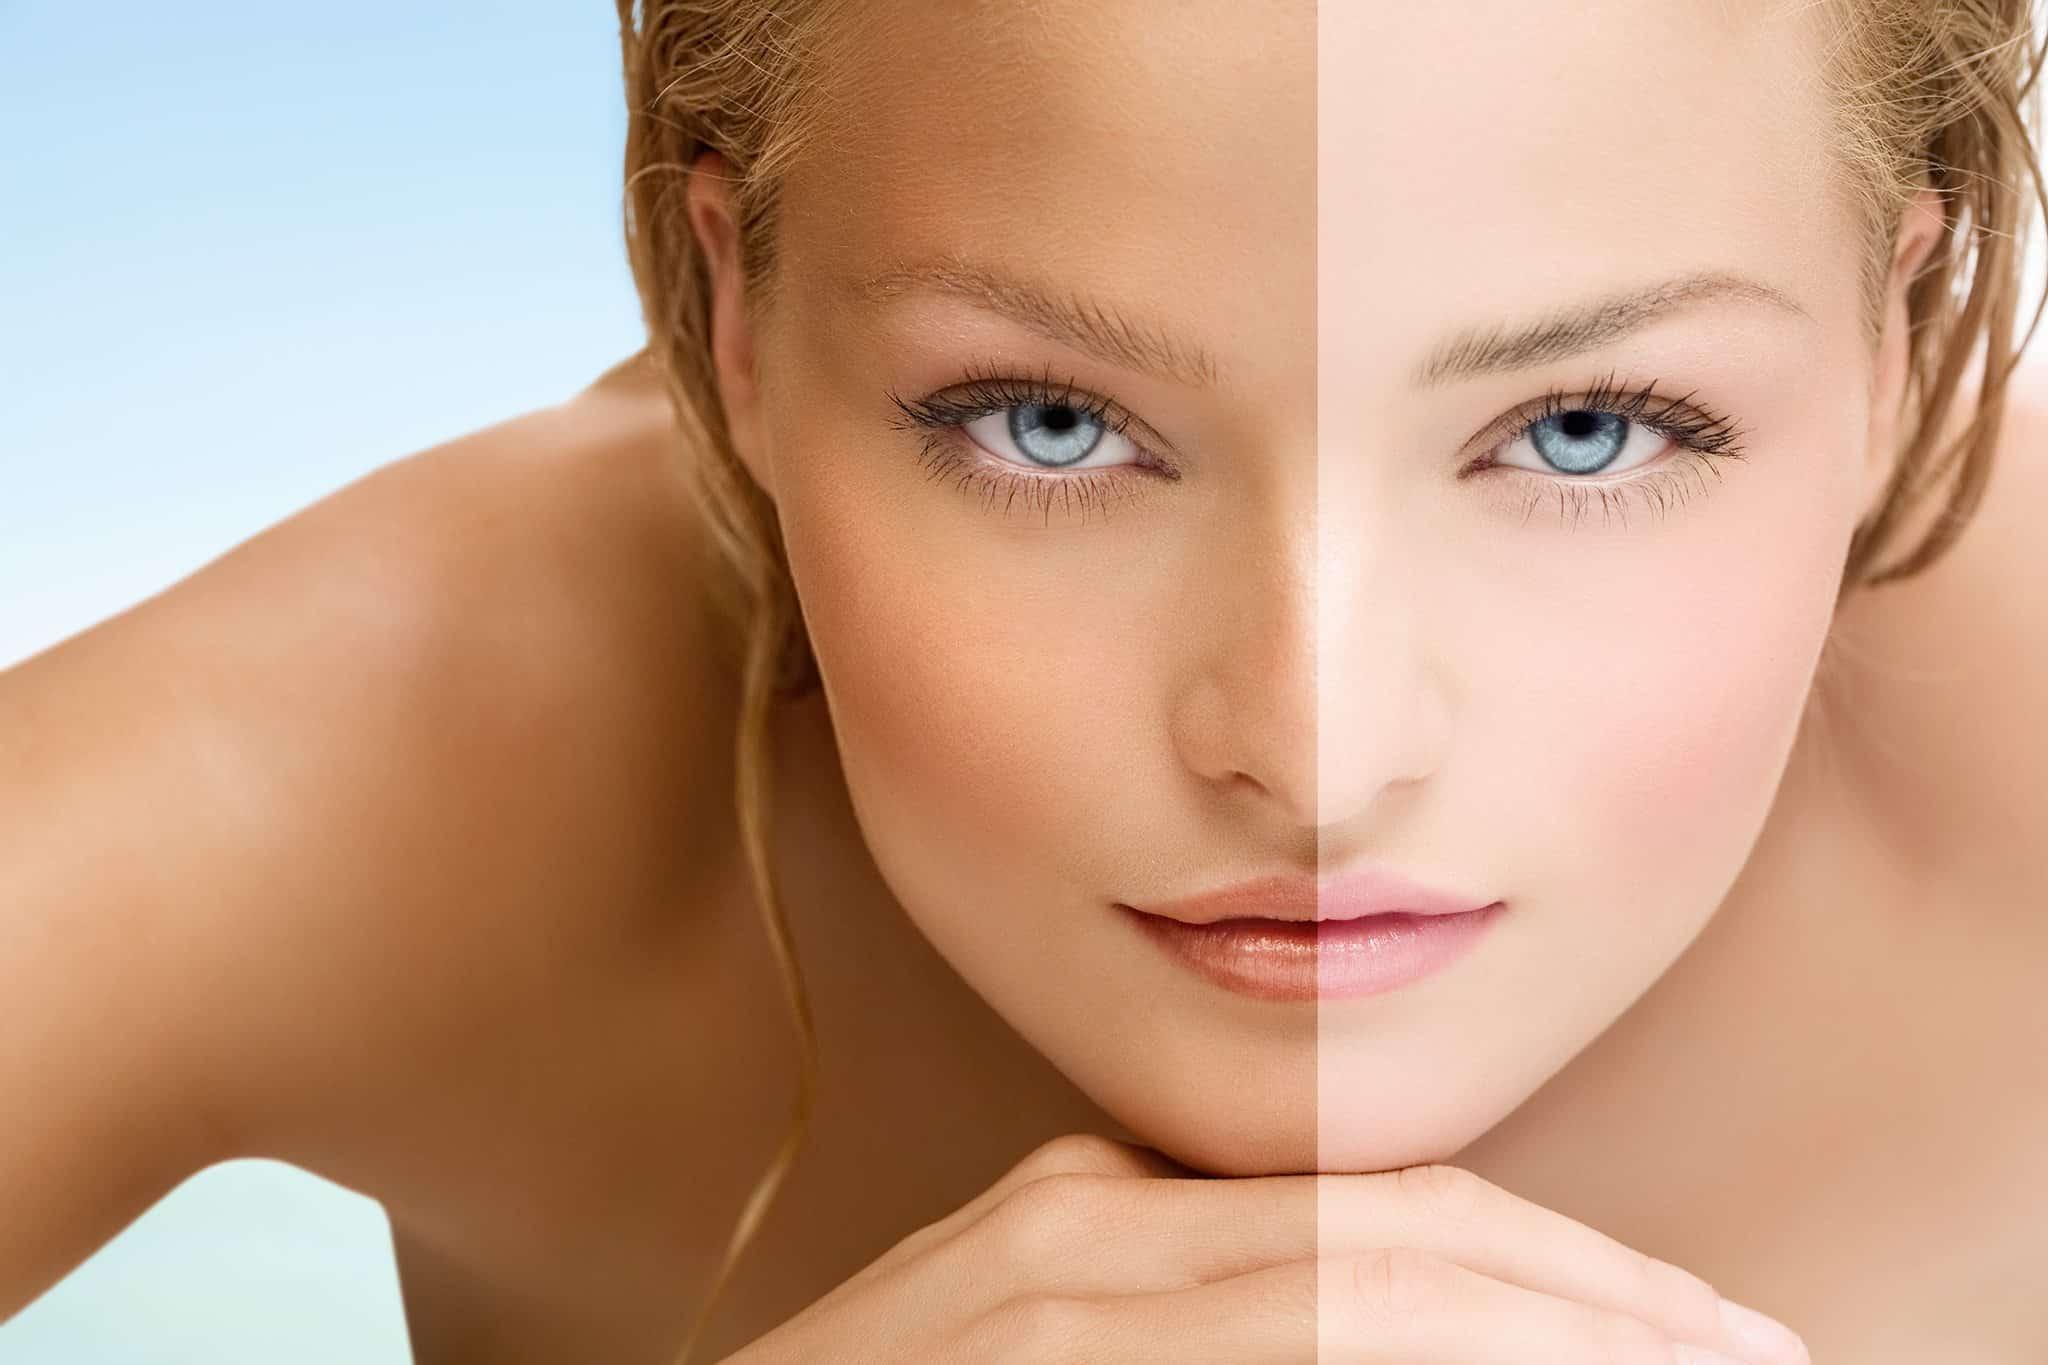 Eclipse Airbrush Tanning - Image 4